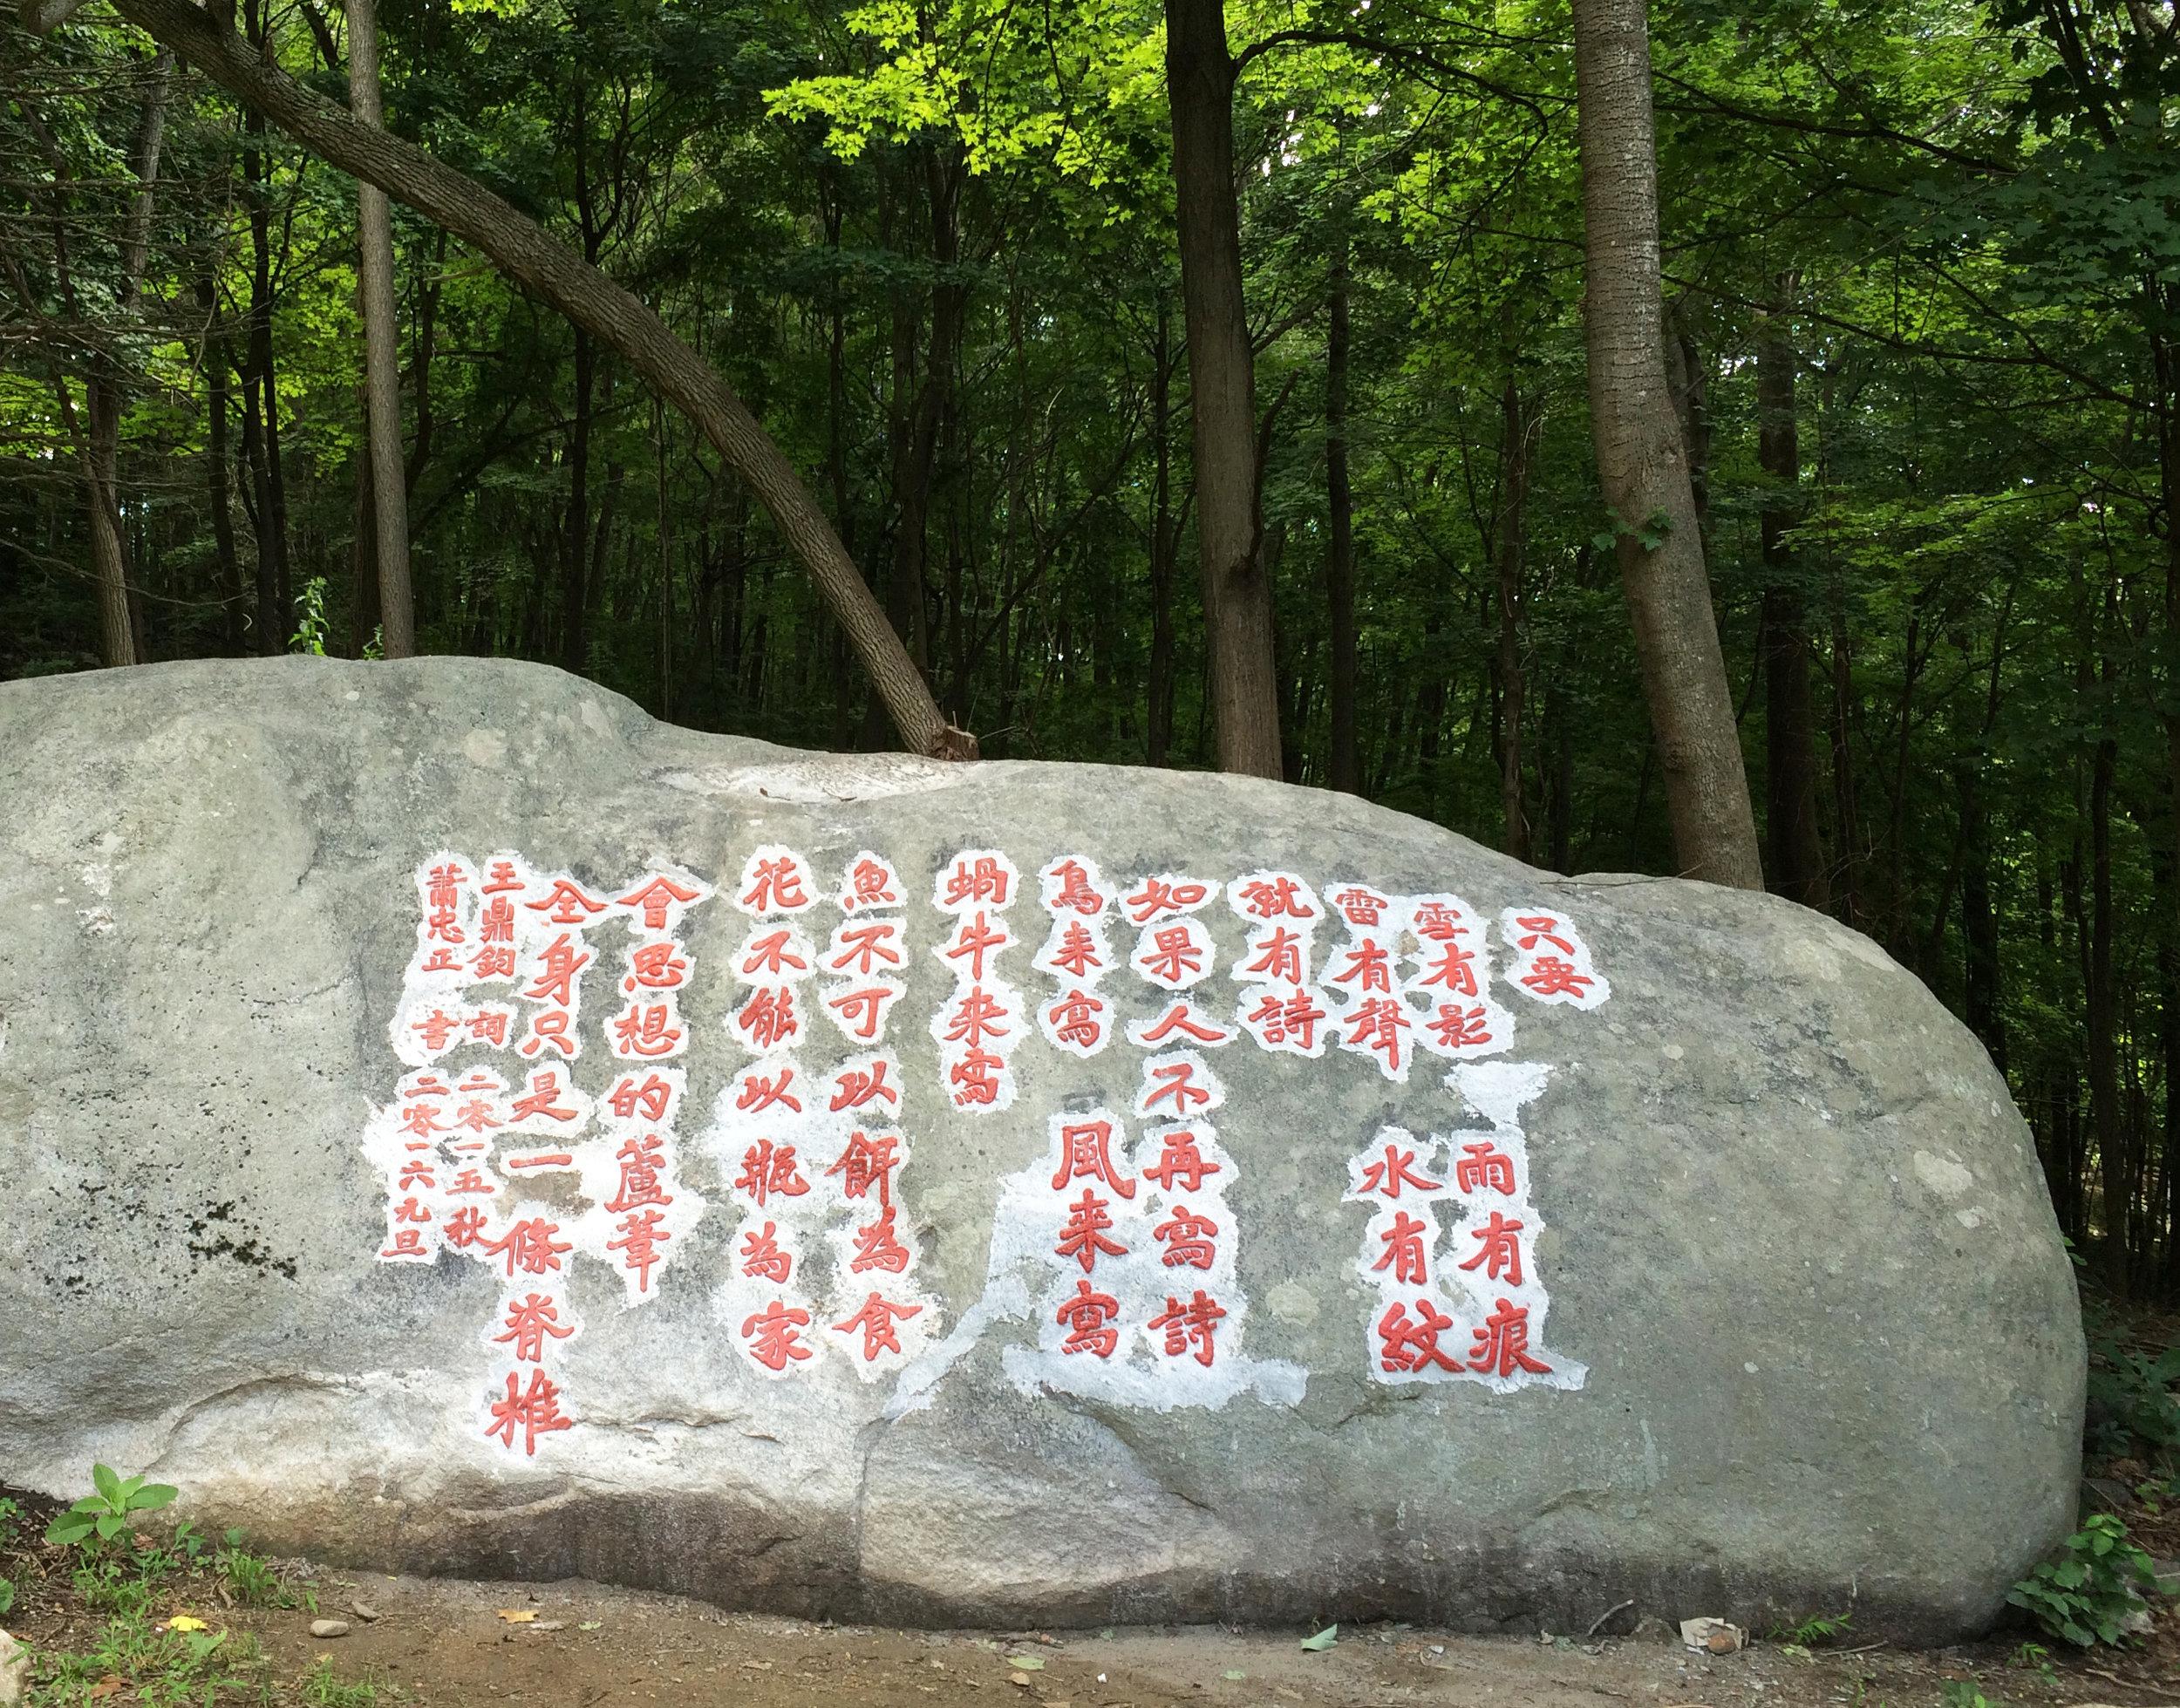 Tingchian Wang | 王鼎鈞    Stone carving.  Poem, by Tingchian Wang (王鼎鈞) , Calligraphy, by James Shau (蕭忠正)